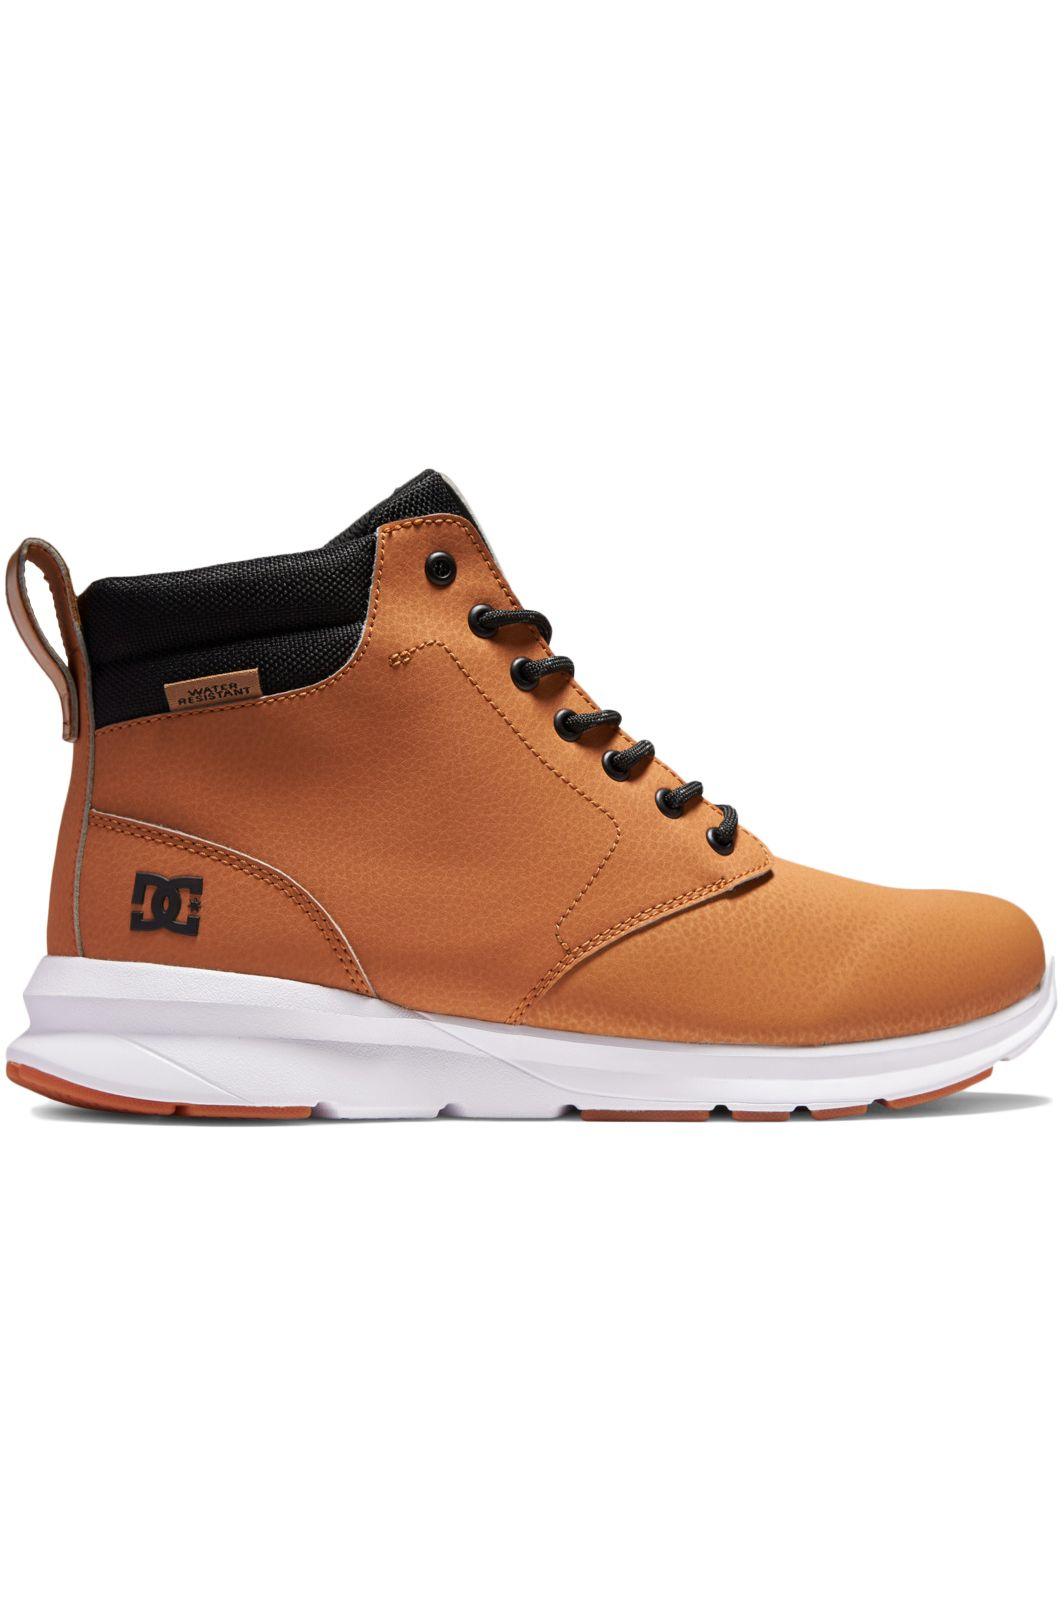 DC Shoes Boots MASON 2 Wheat/Black